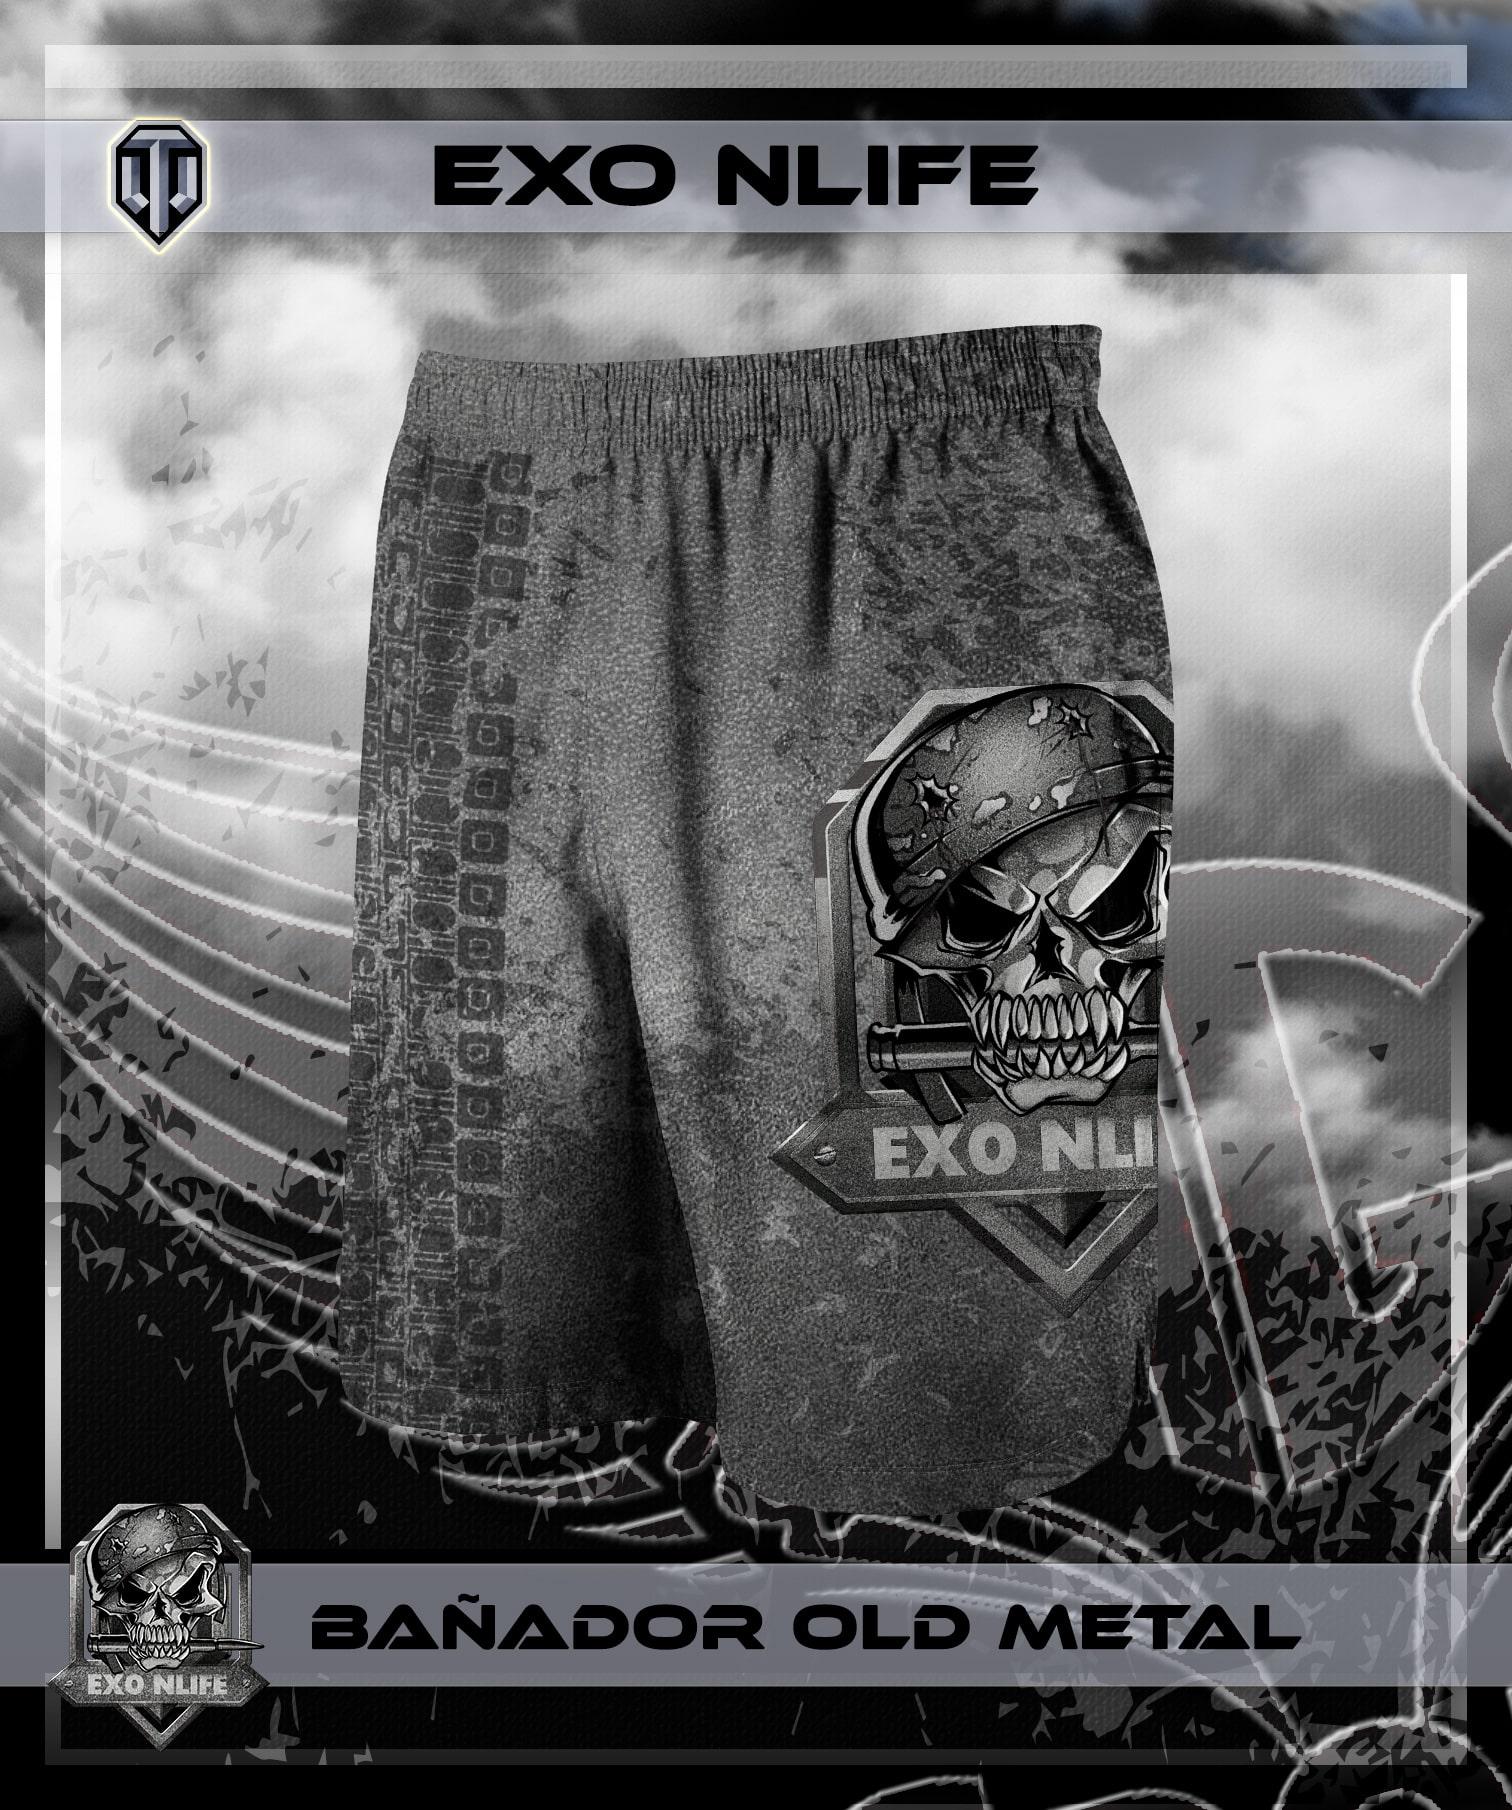 Bañador Old Metal